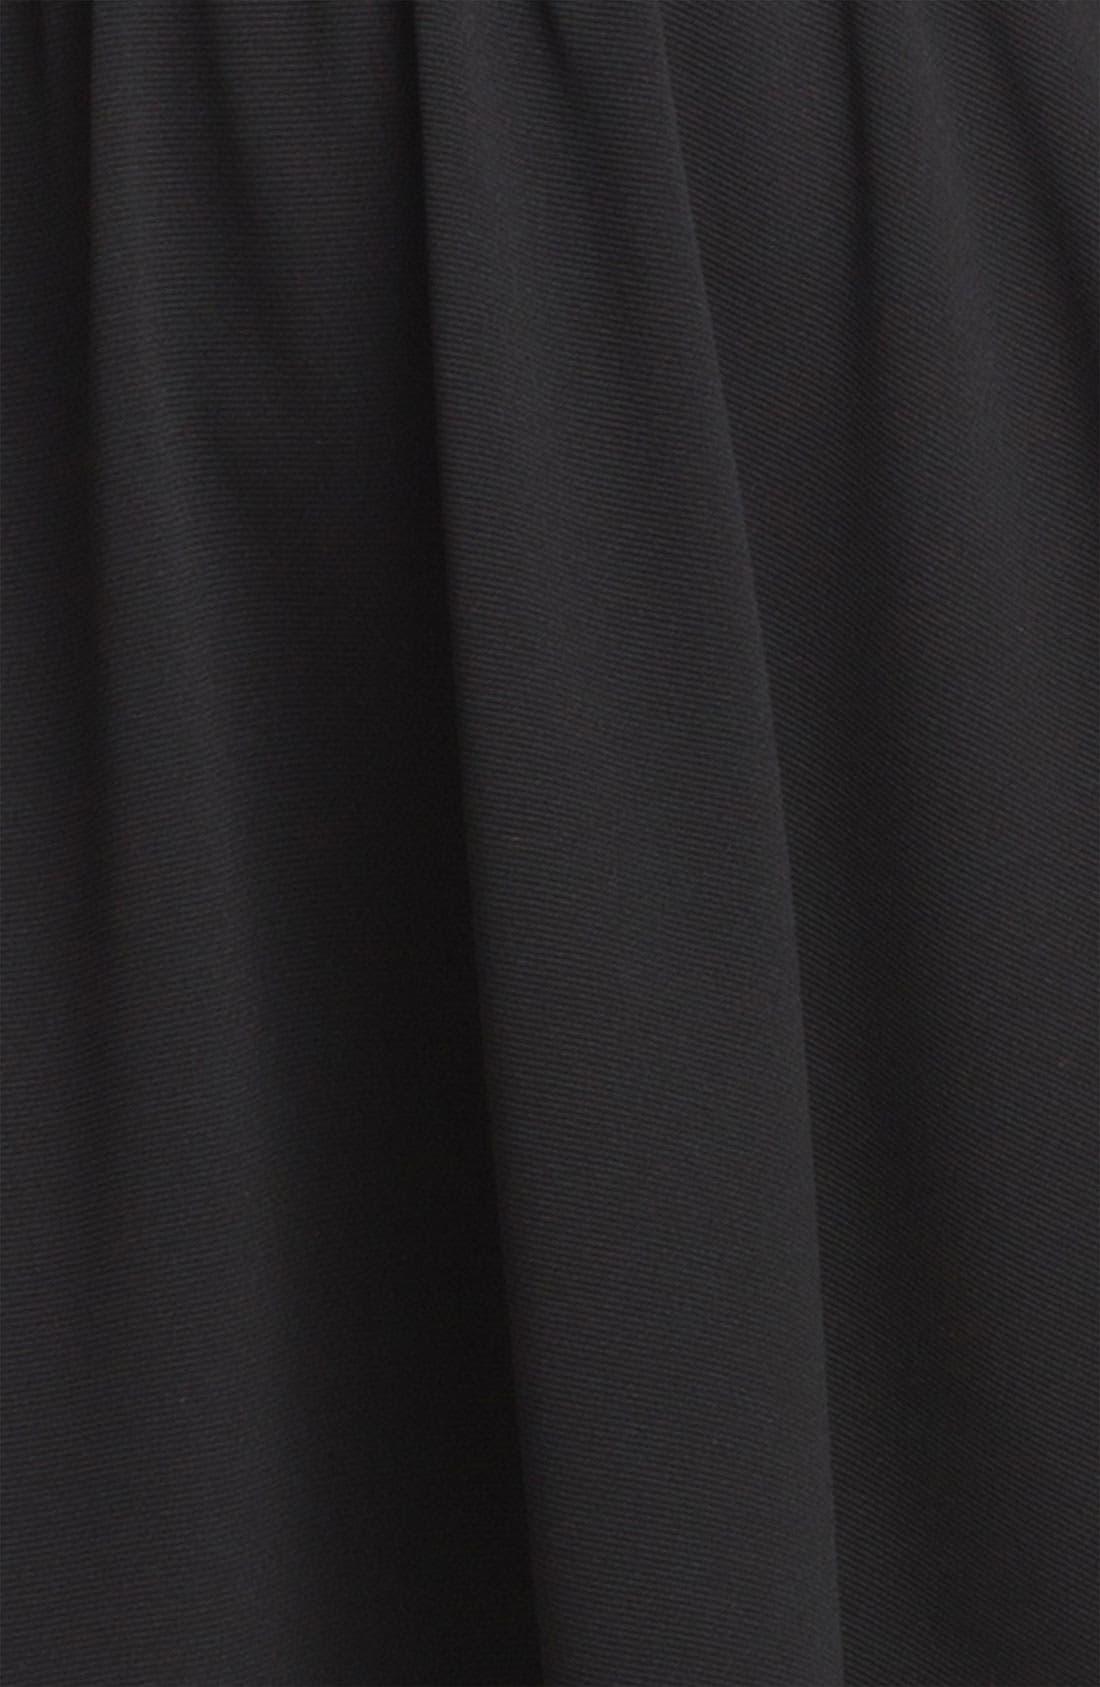 Alternate Image 3  - Lush Illusion Fit & Flare Dress (Juniors)